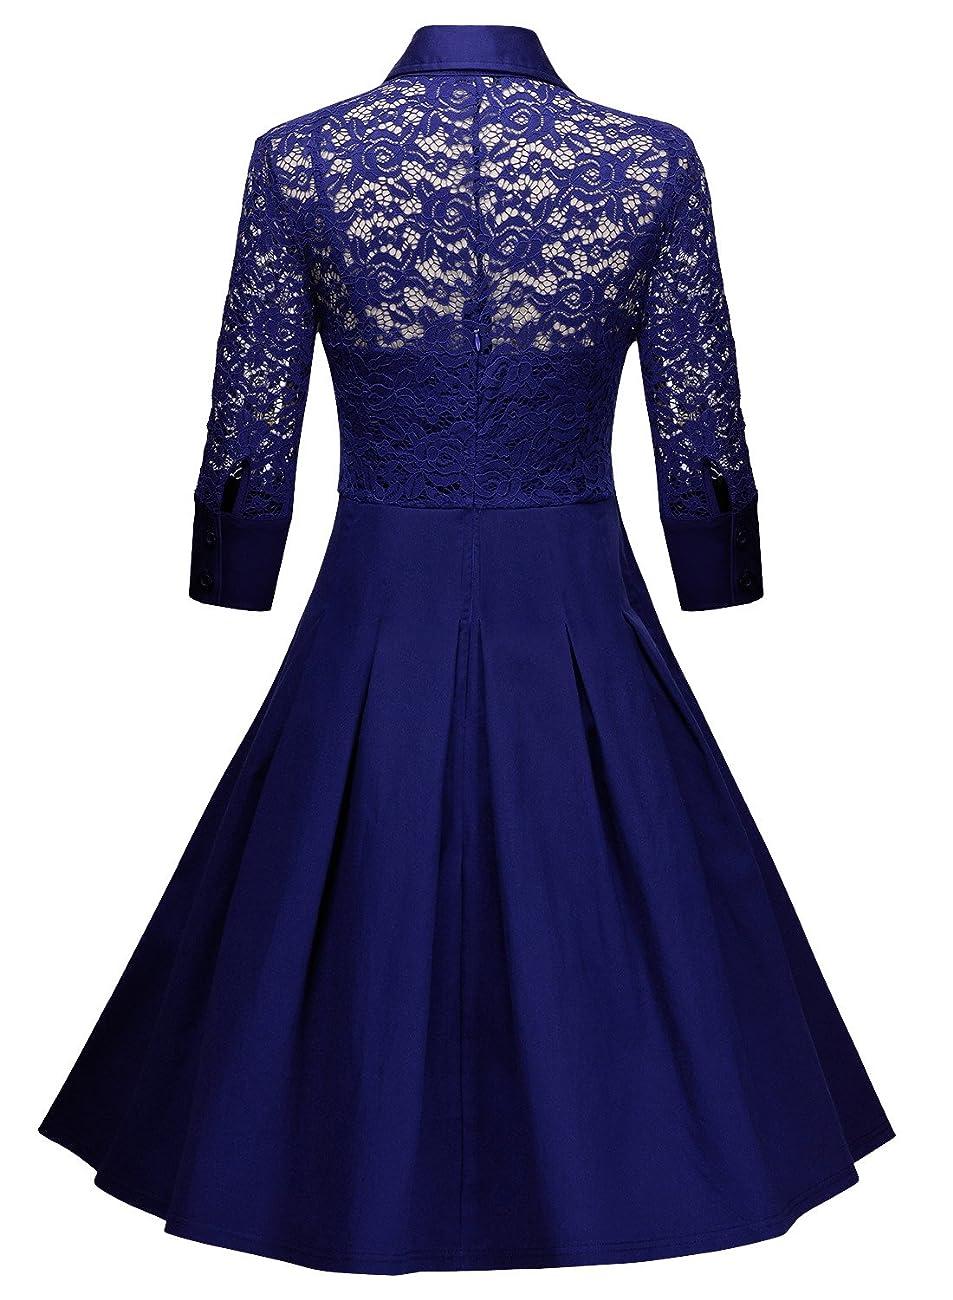 Missmay Women's Vintage 1950s Style 3/4 Sleeve Black Lace Flare A-line Dress 3